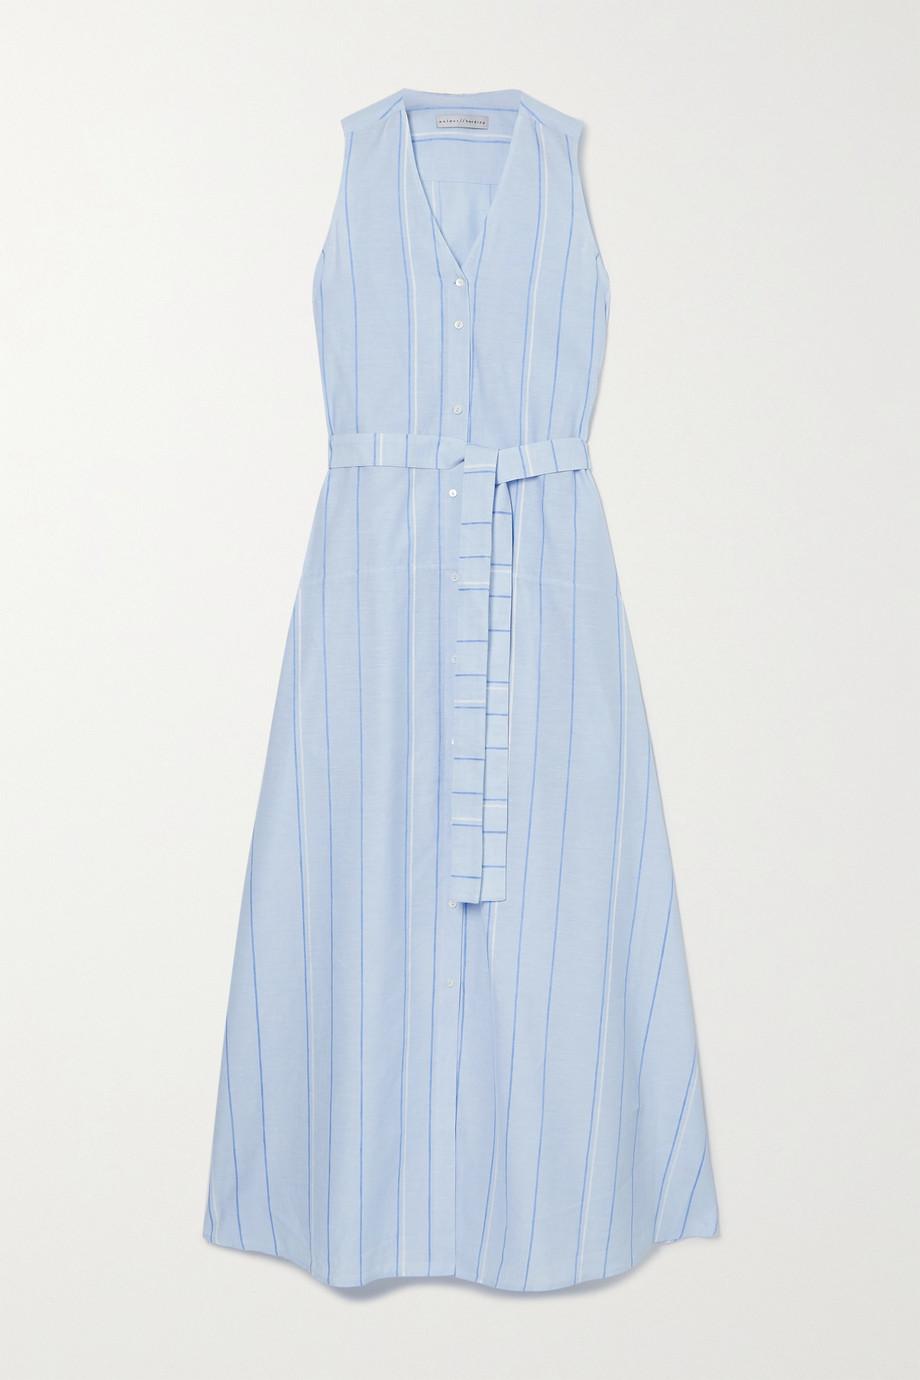 palmer//harding Sedona 条纹配腰带棉麻混纺超长连衣裙